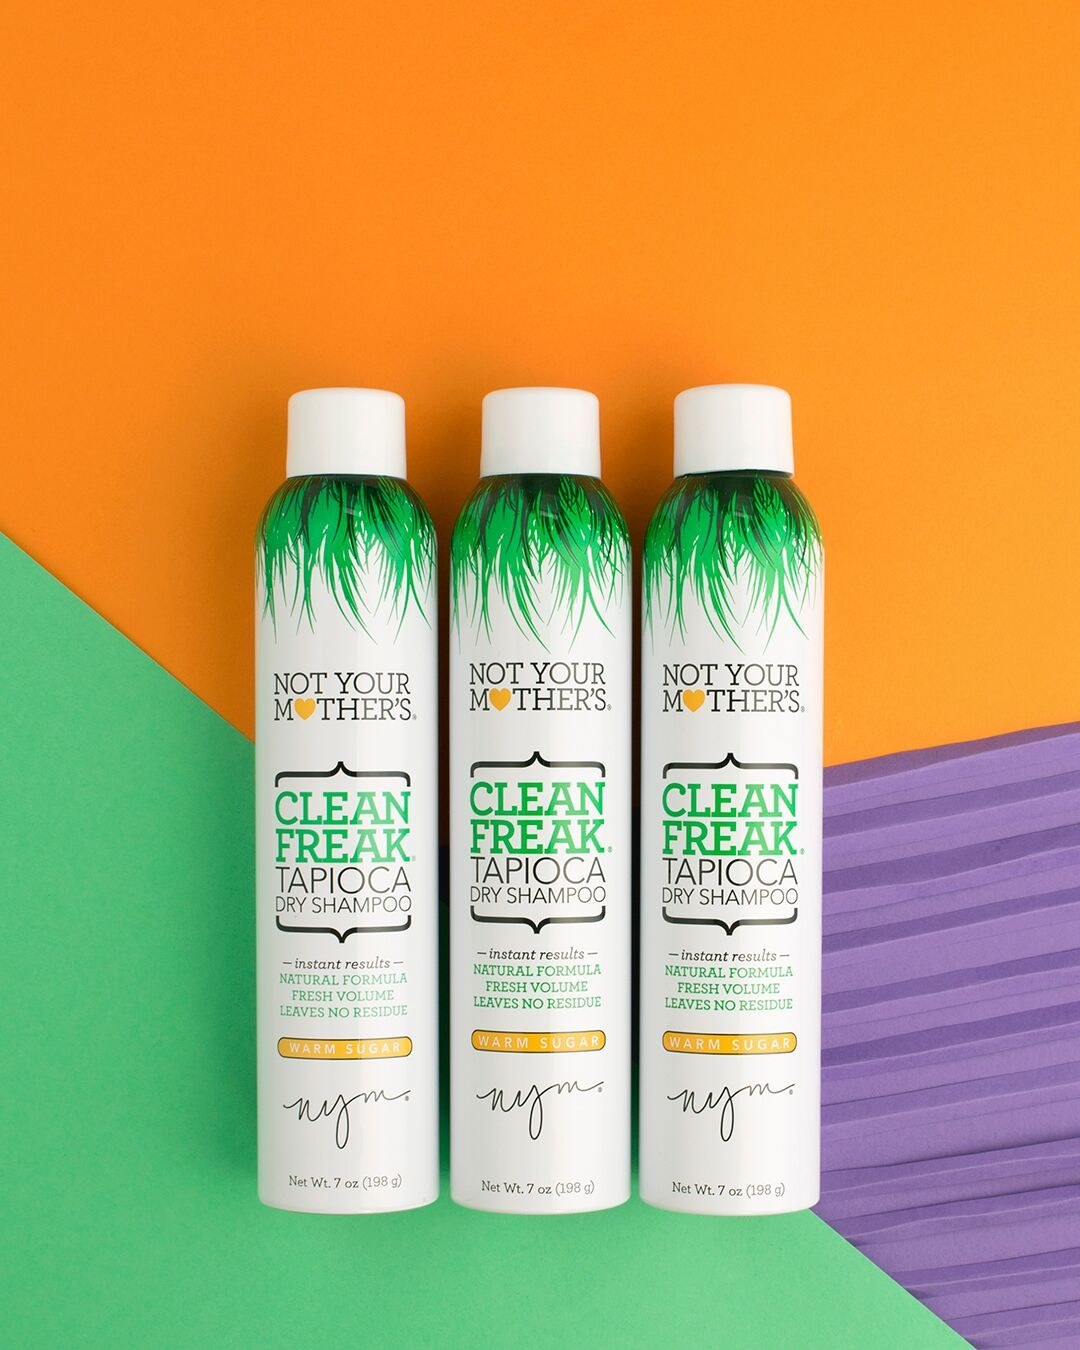 Not Your Mother S Clean Freak Tapioca Dry Shampoo Ulta Beauty Dry Shampoo Shampoo At Home Hair Removal